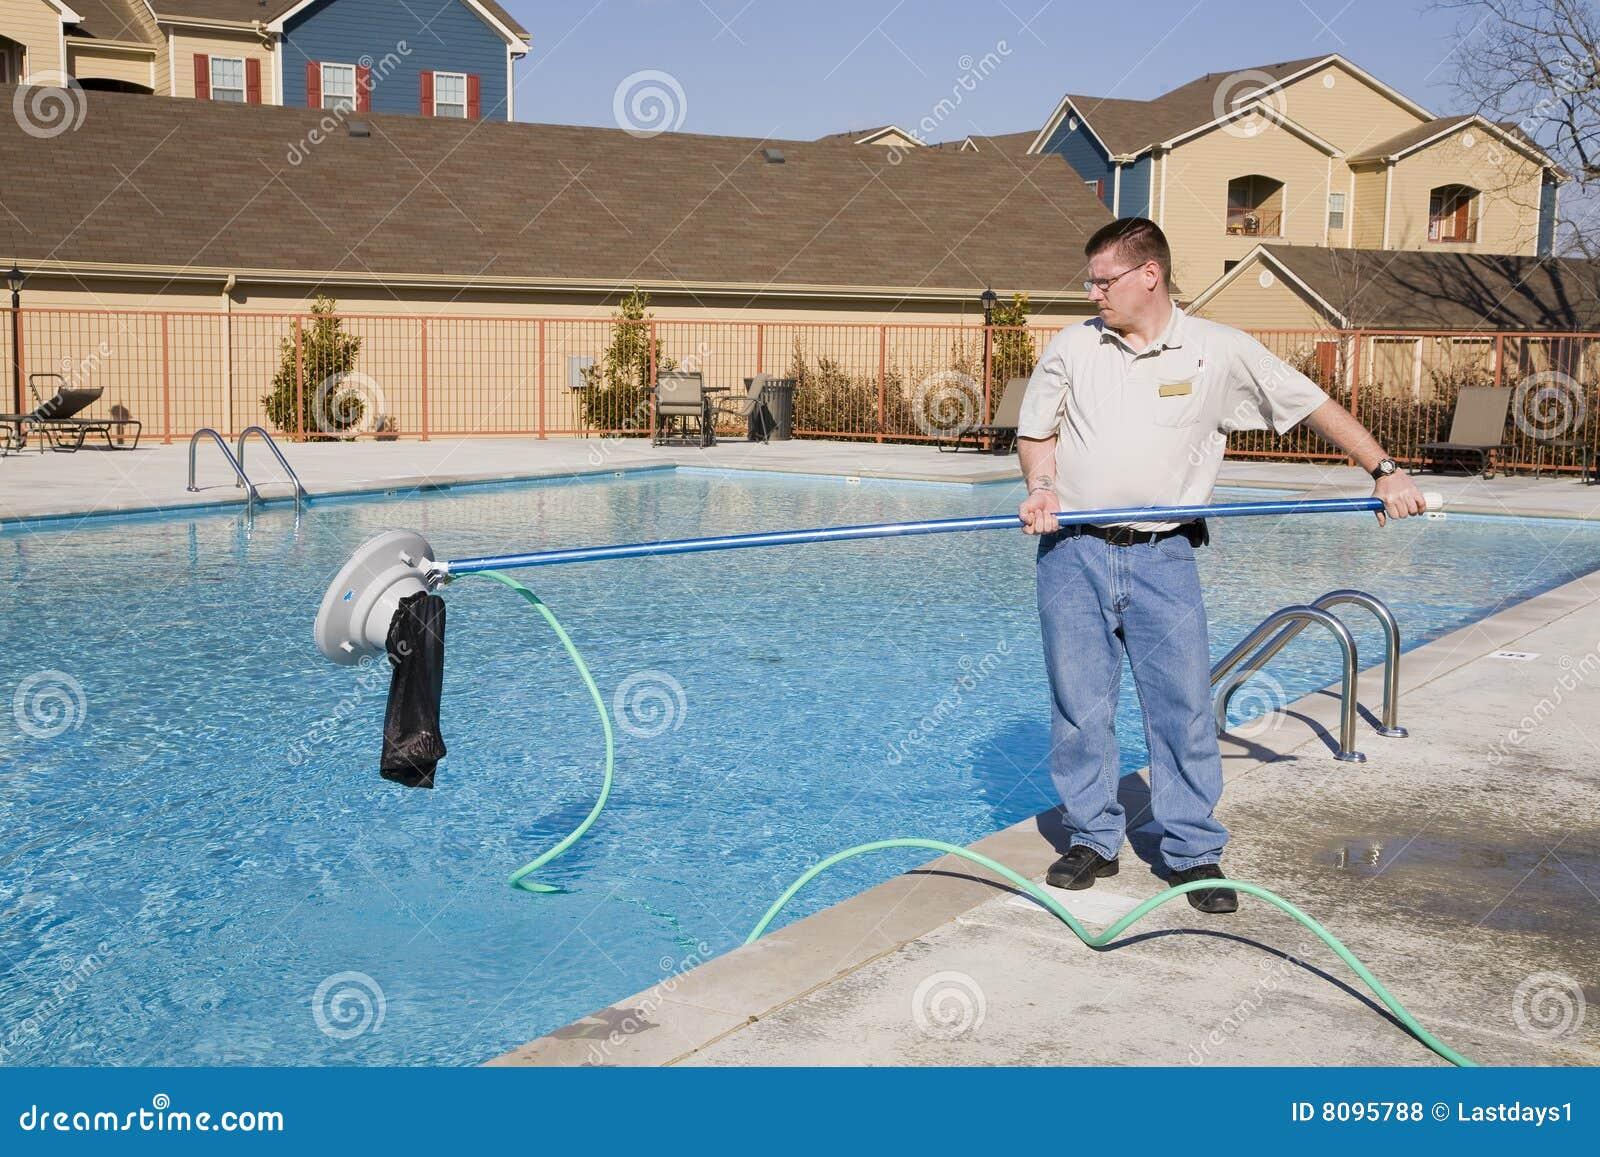 Swimming Pool Service Royalty Free Stock Photos Image 8095788